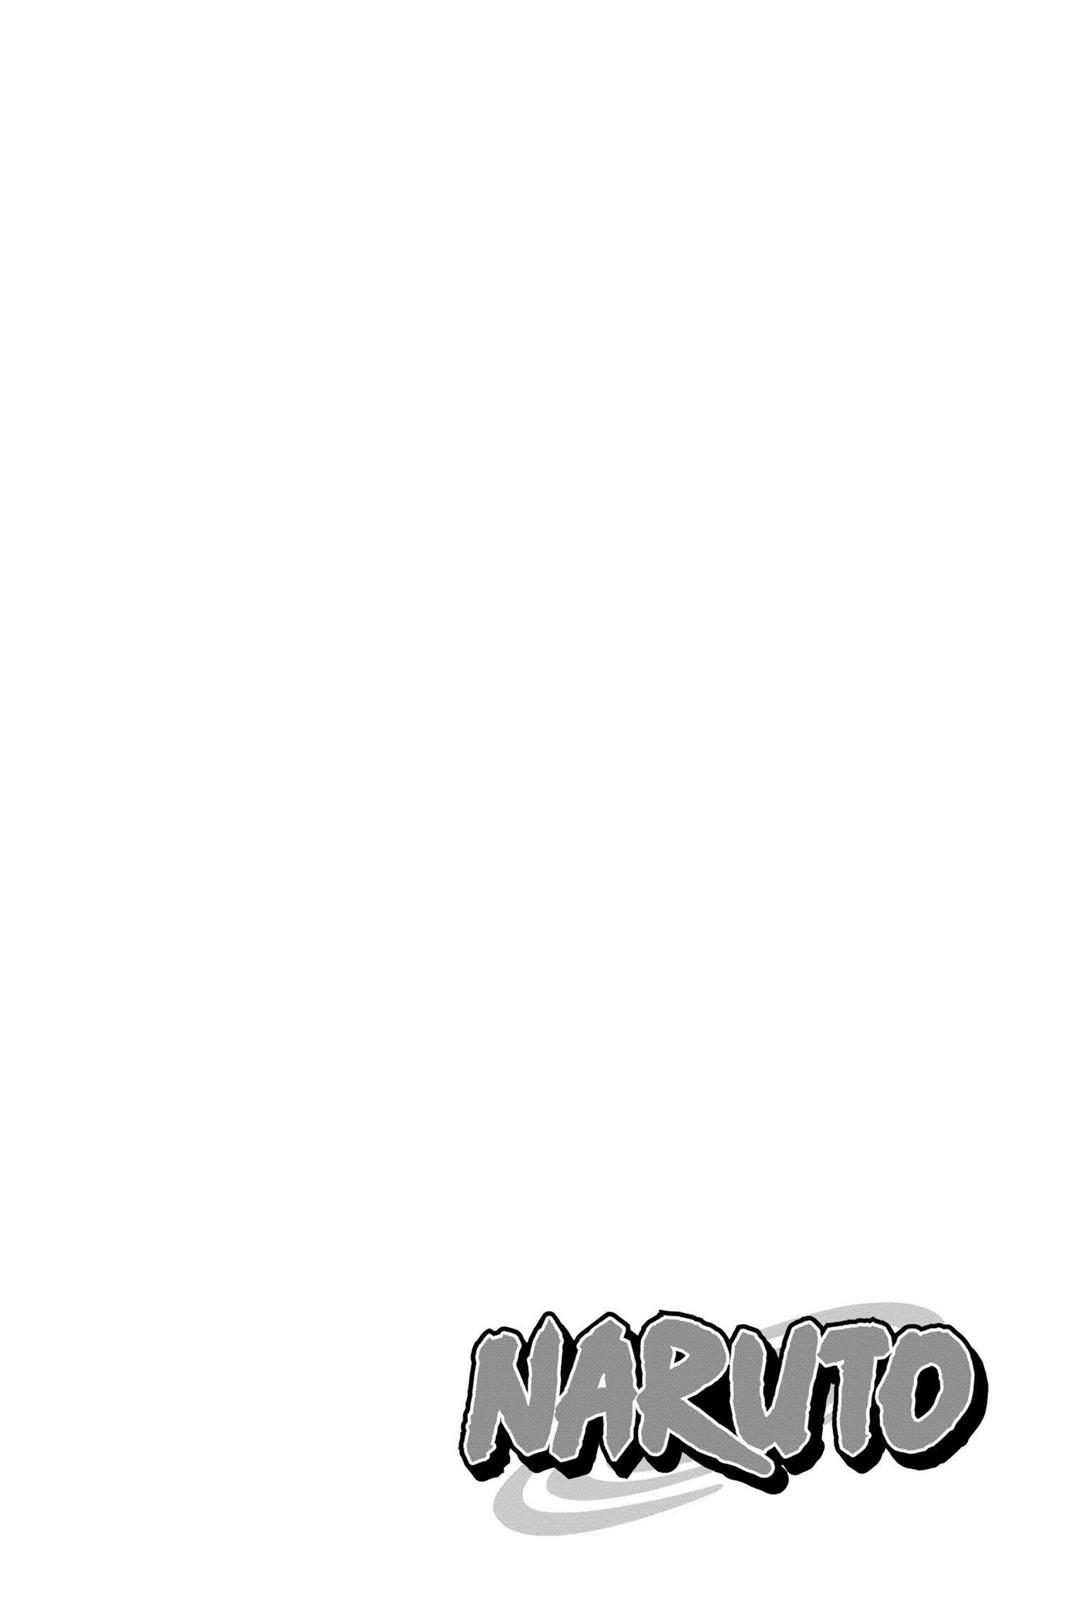 Naruto, Chapter 318 image 020